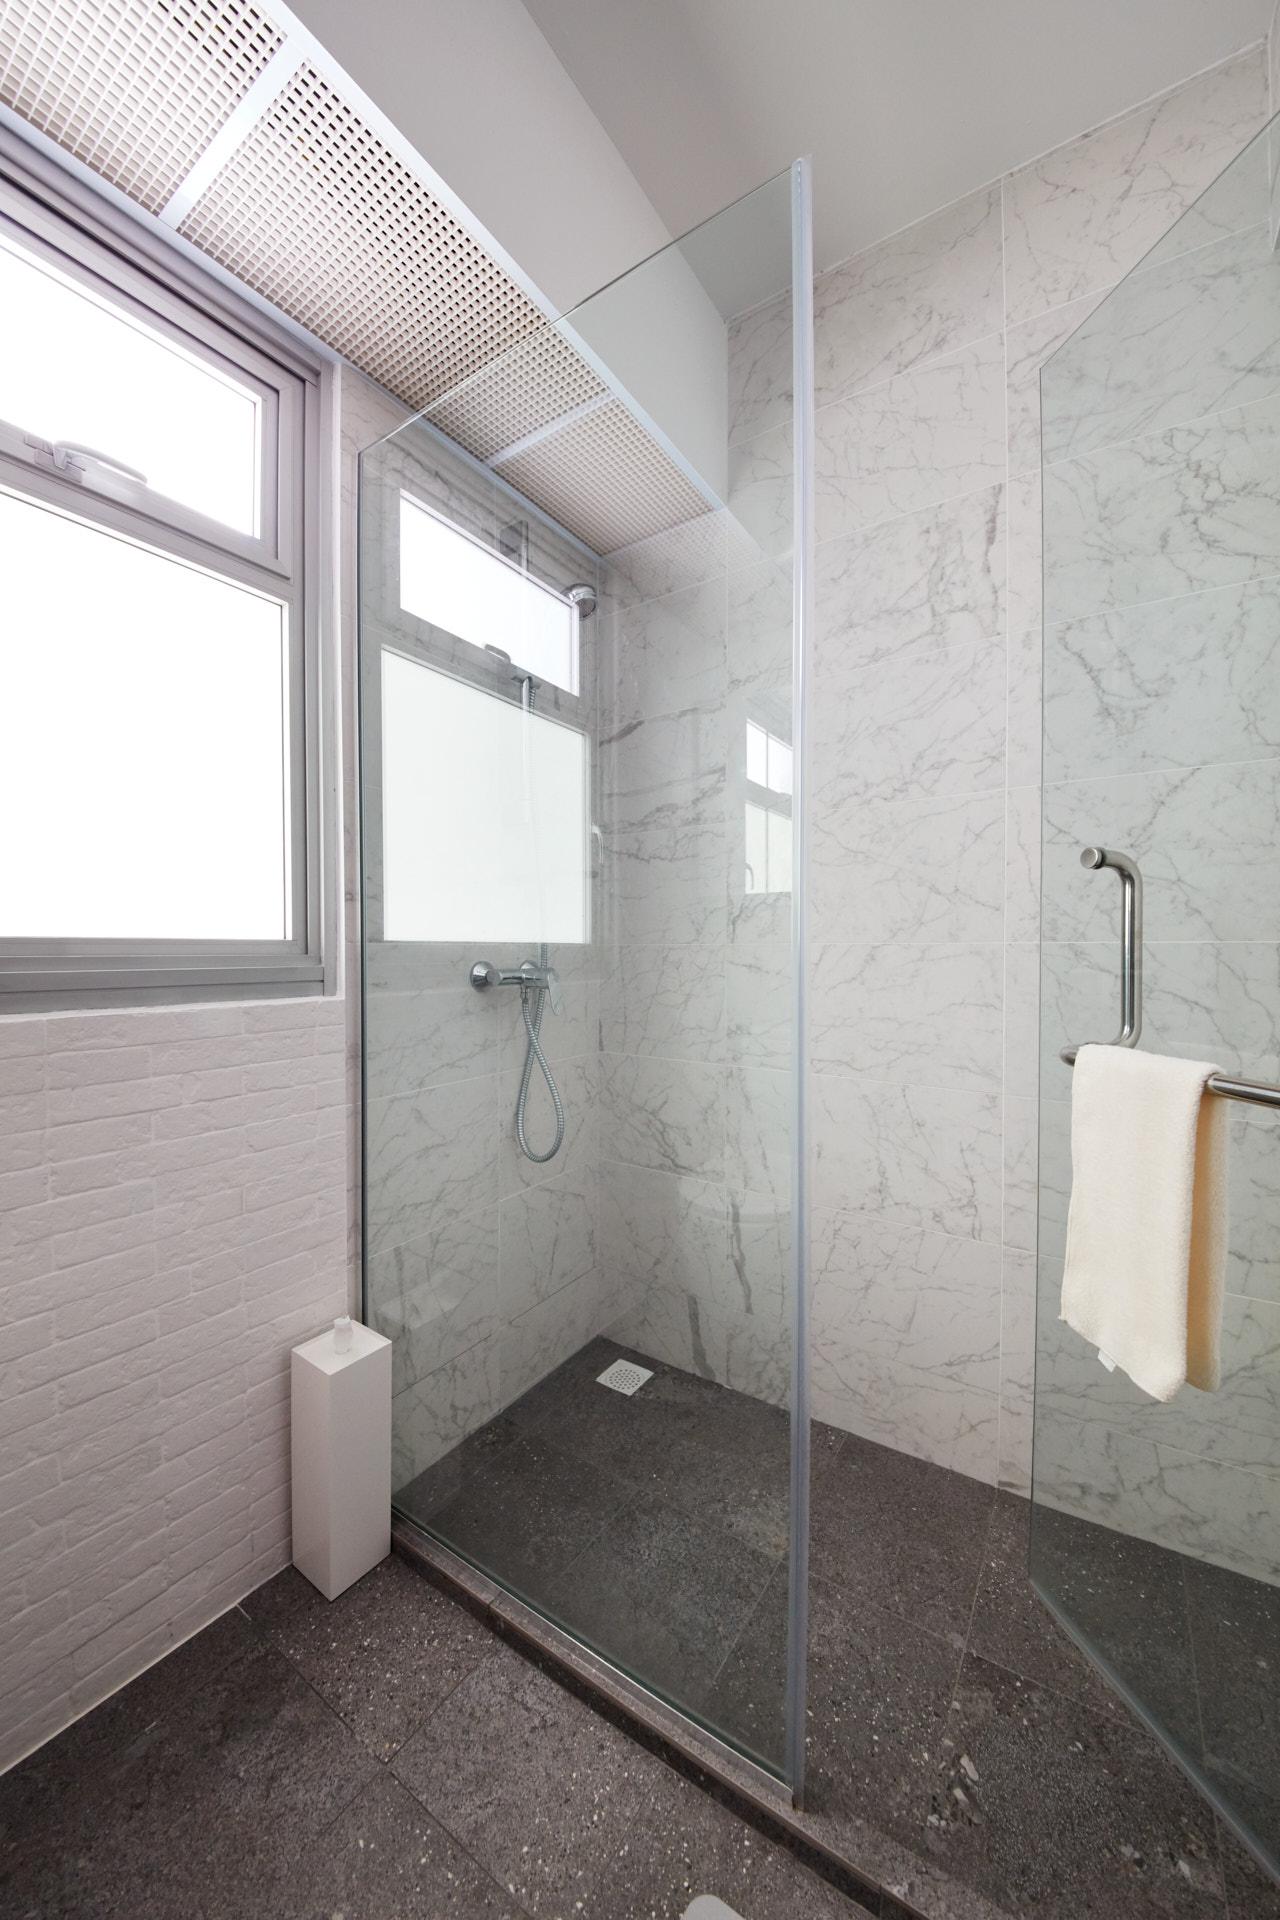 HDB Toilet Renovation Tips - Glass Divider